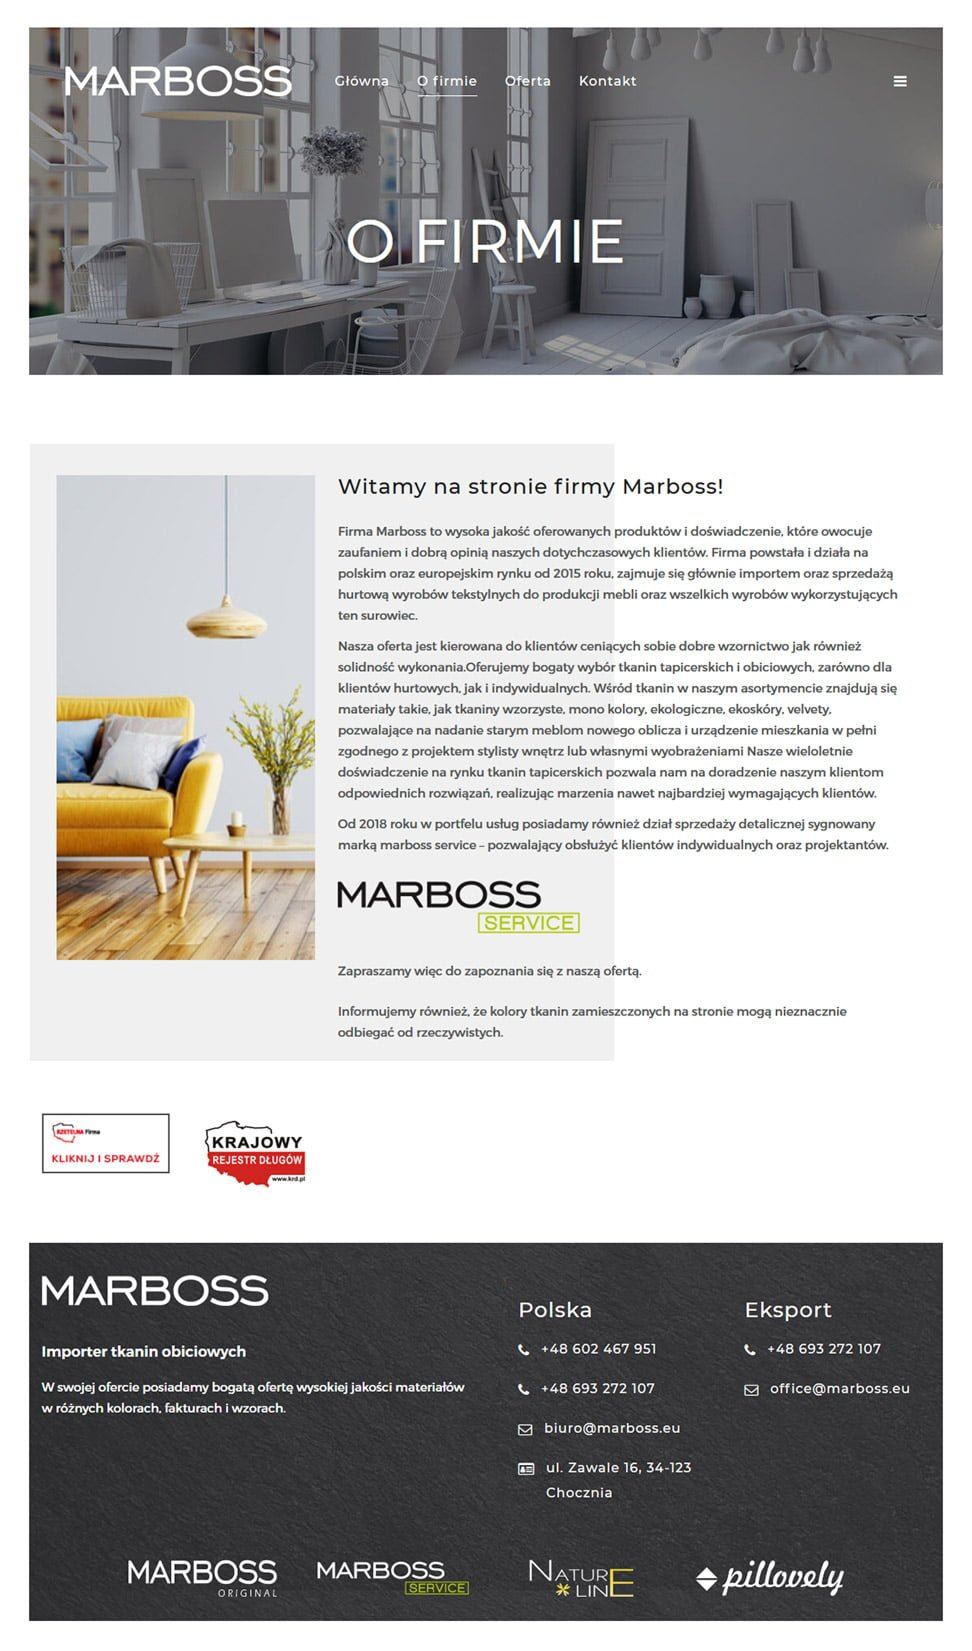 Marboss